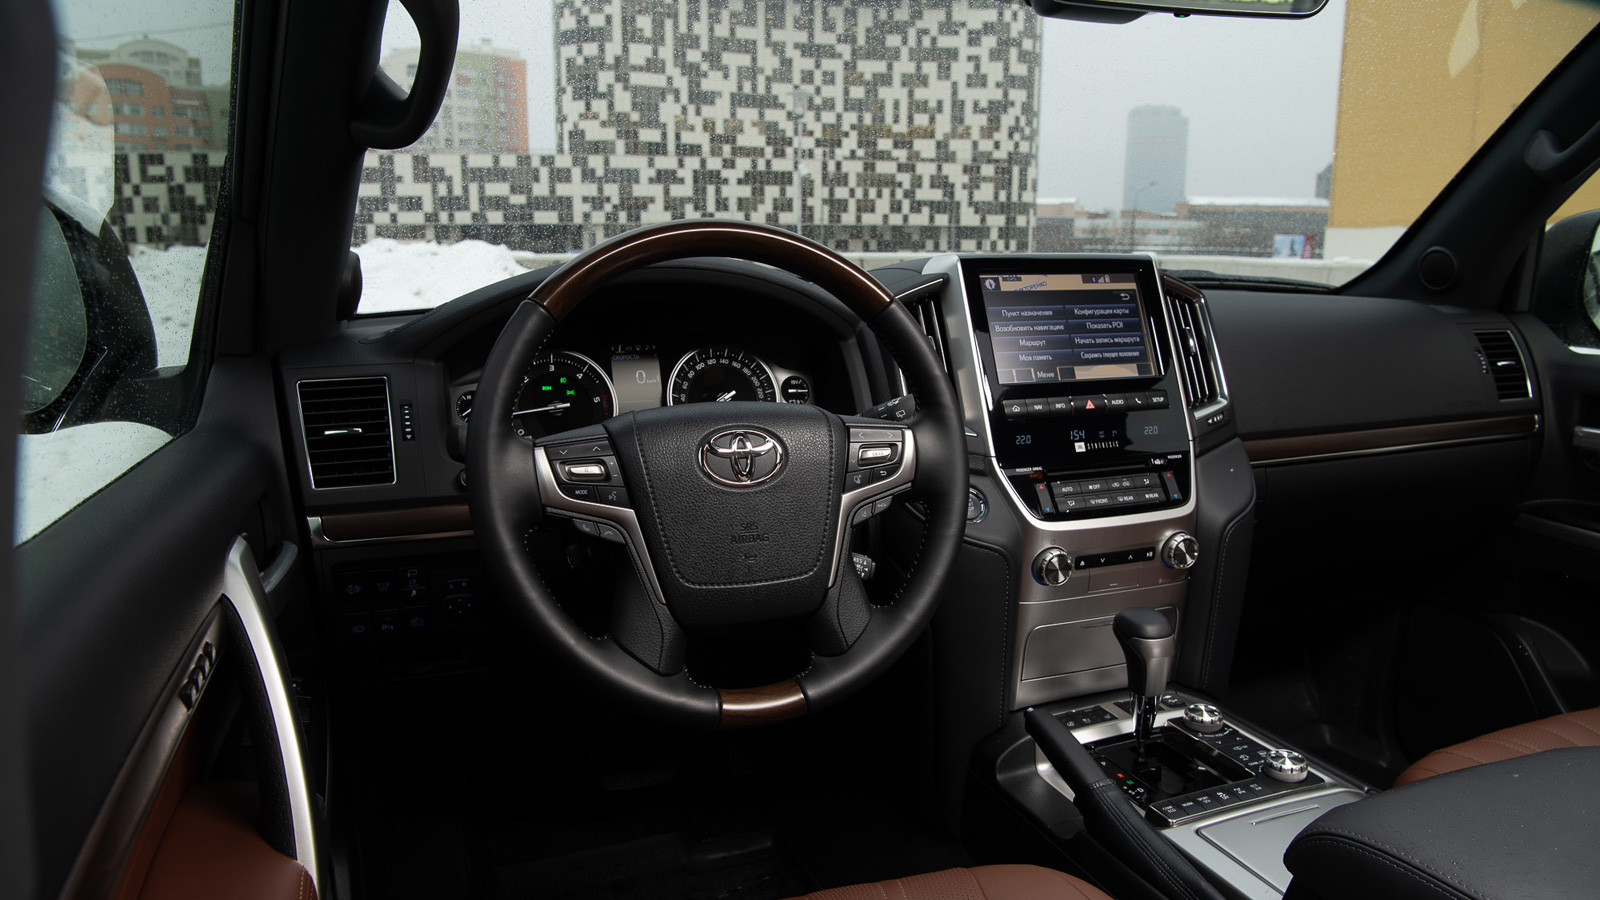 002-lc200-interior-winter_1600x900_tcm-3